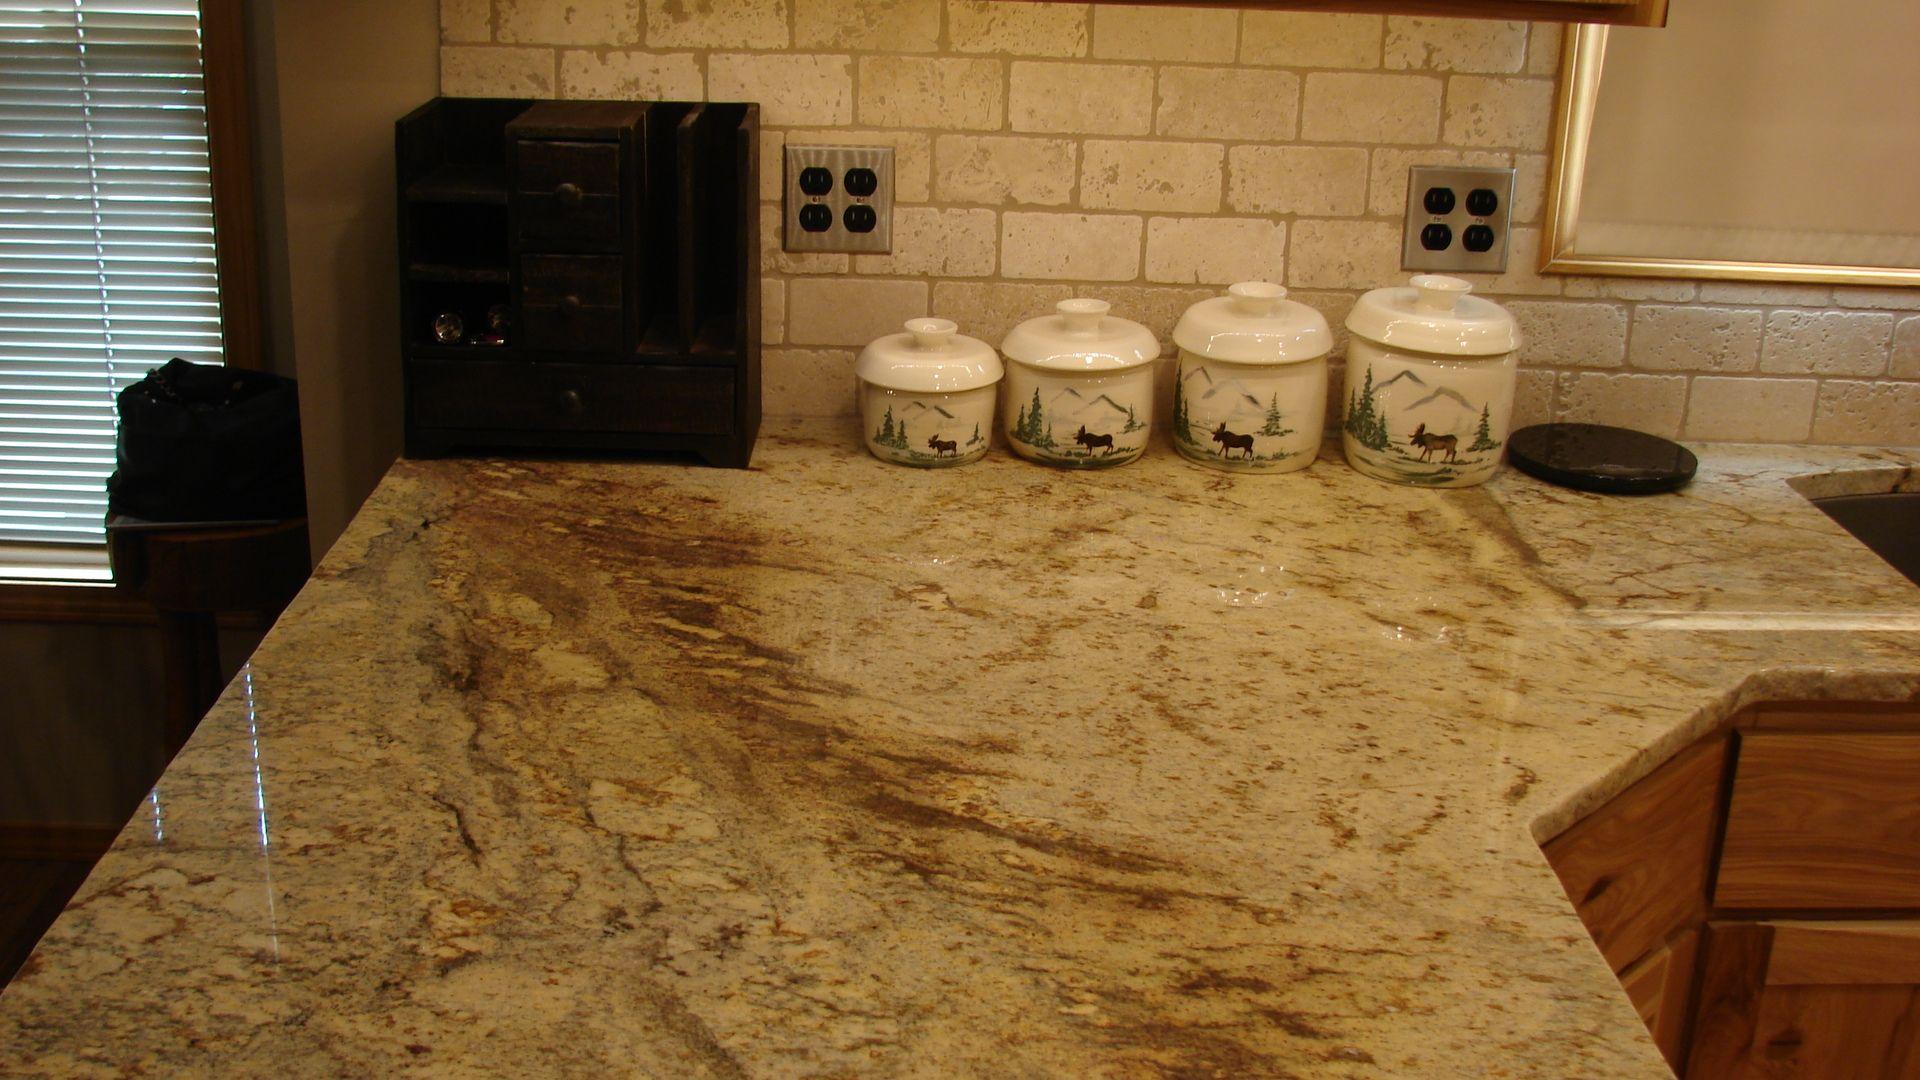 3cm Typhoon Bordeaux Granite Counter, with Tumbled ... on Typhoon Bordeaux Granite Backsplash Ideas  id=95350